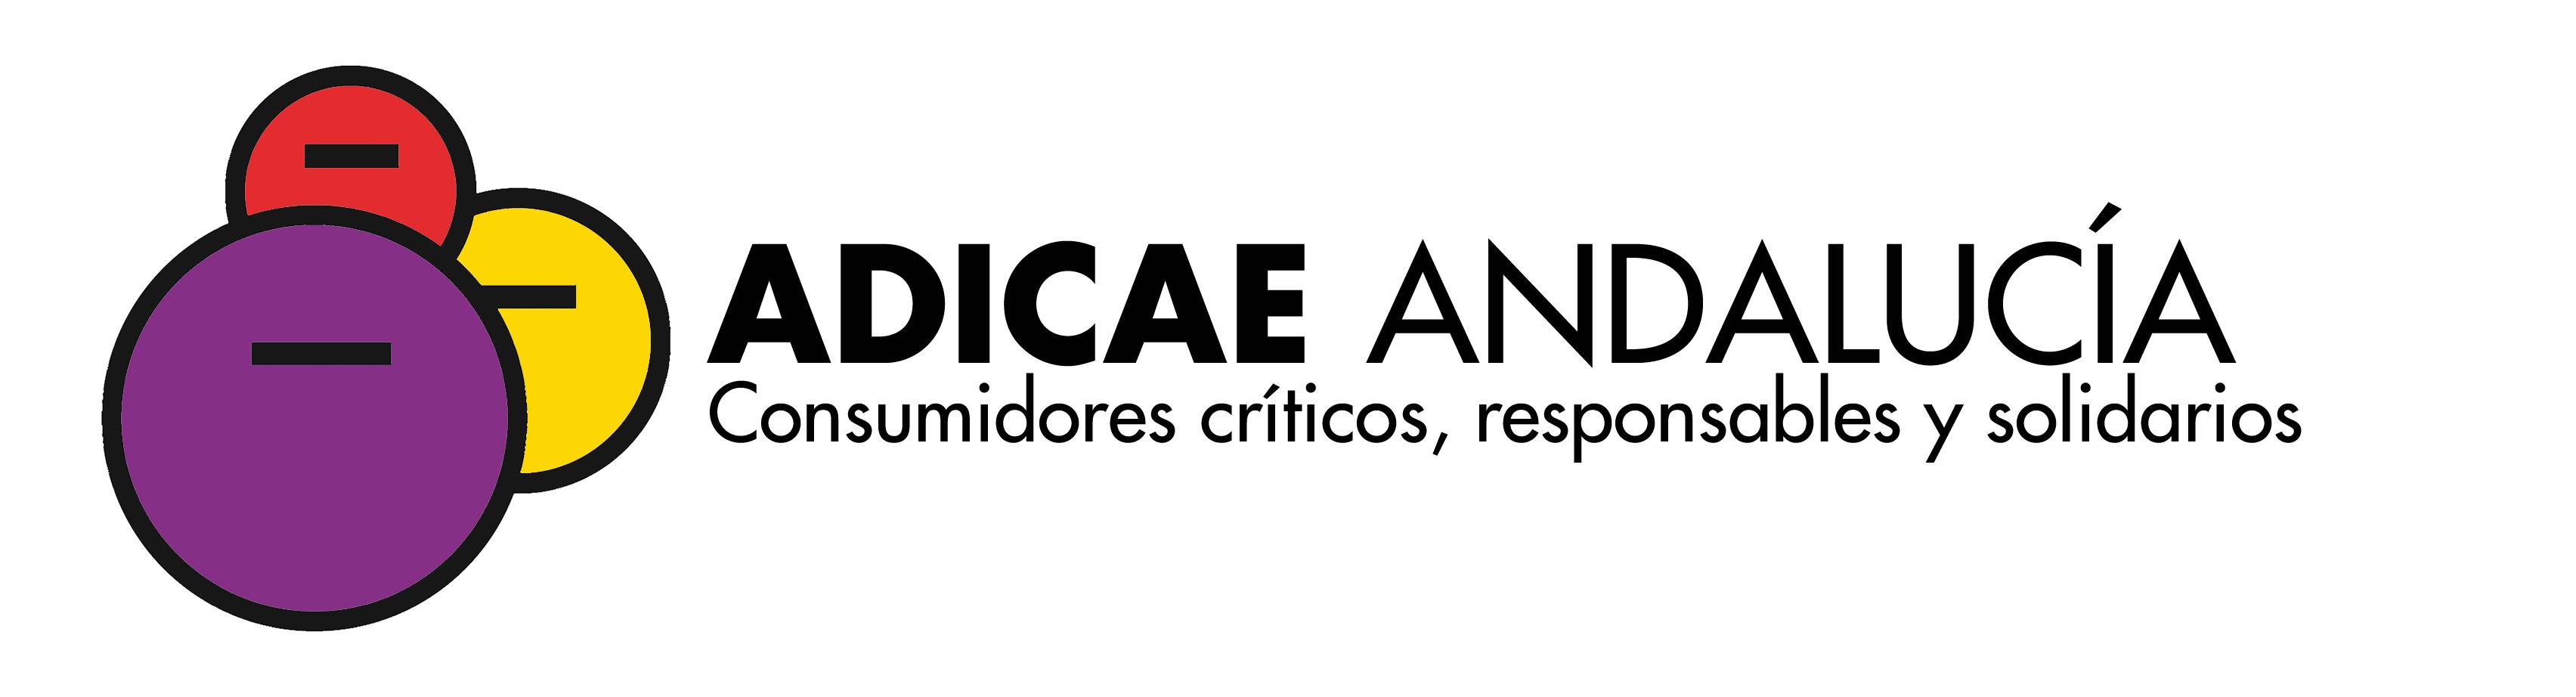 Adicae andaluc a asociaci n de usuarios de bancos cajas for Oficina consumidor granada